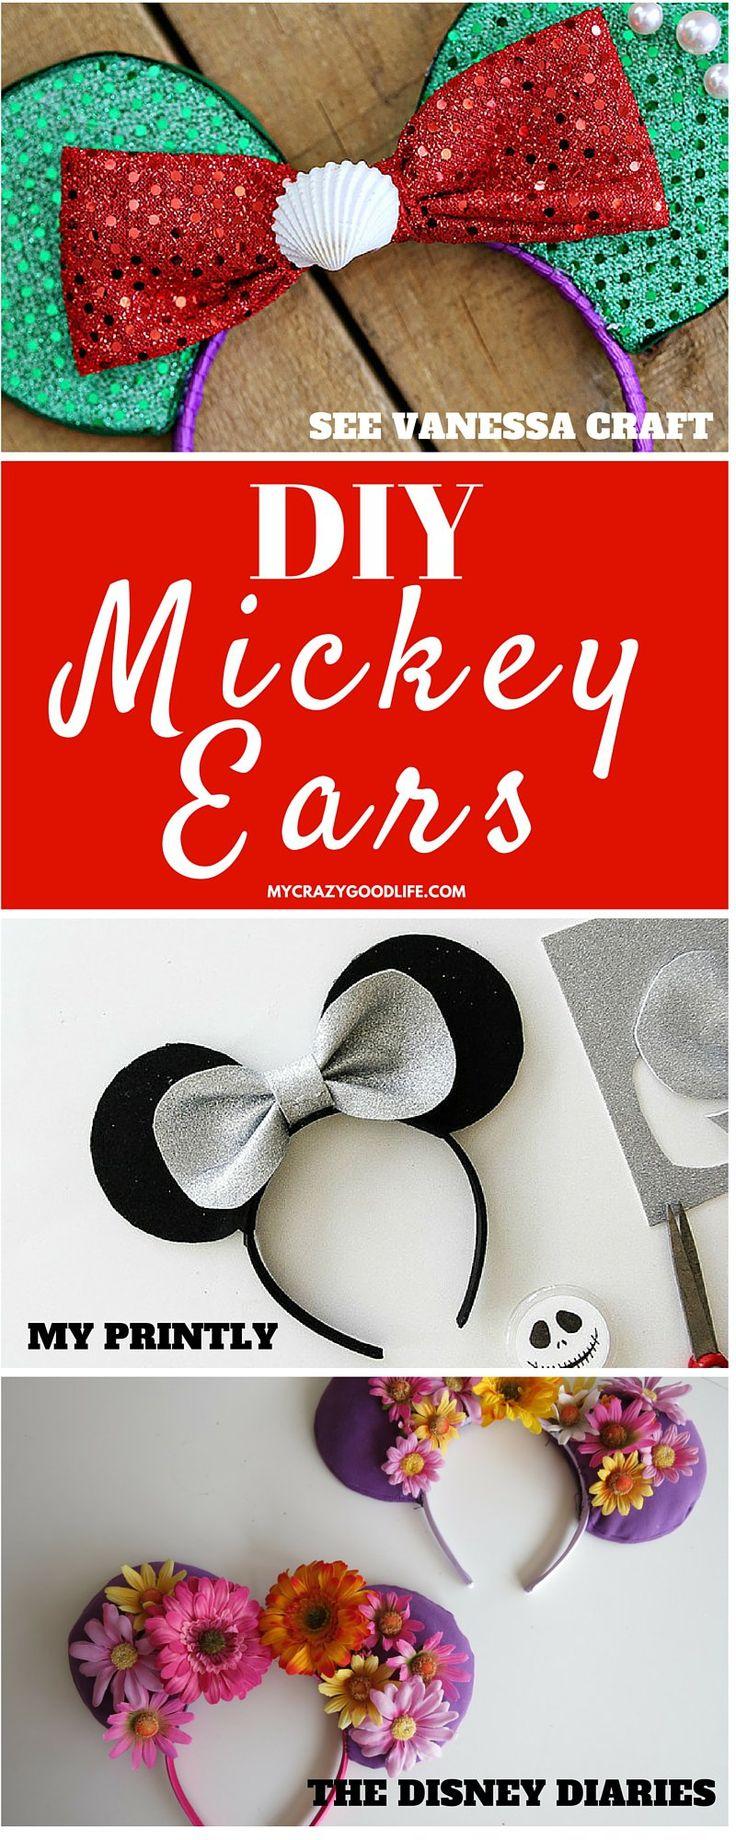 25+ Best Ideas About Disney Family Shirts On Pinterest ...